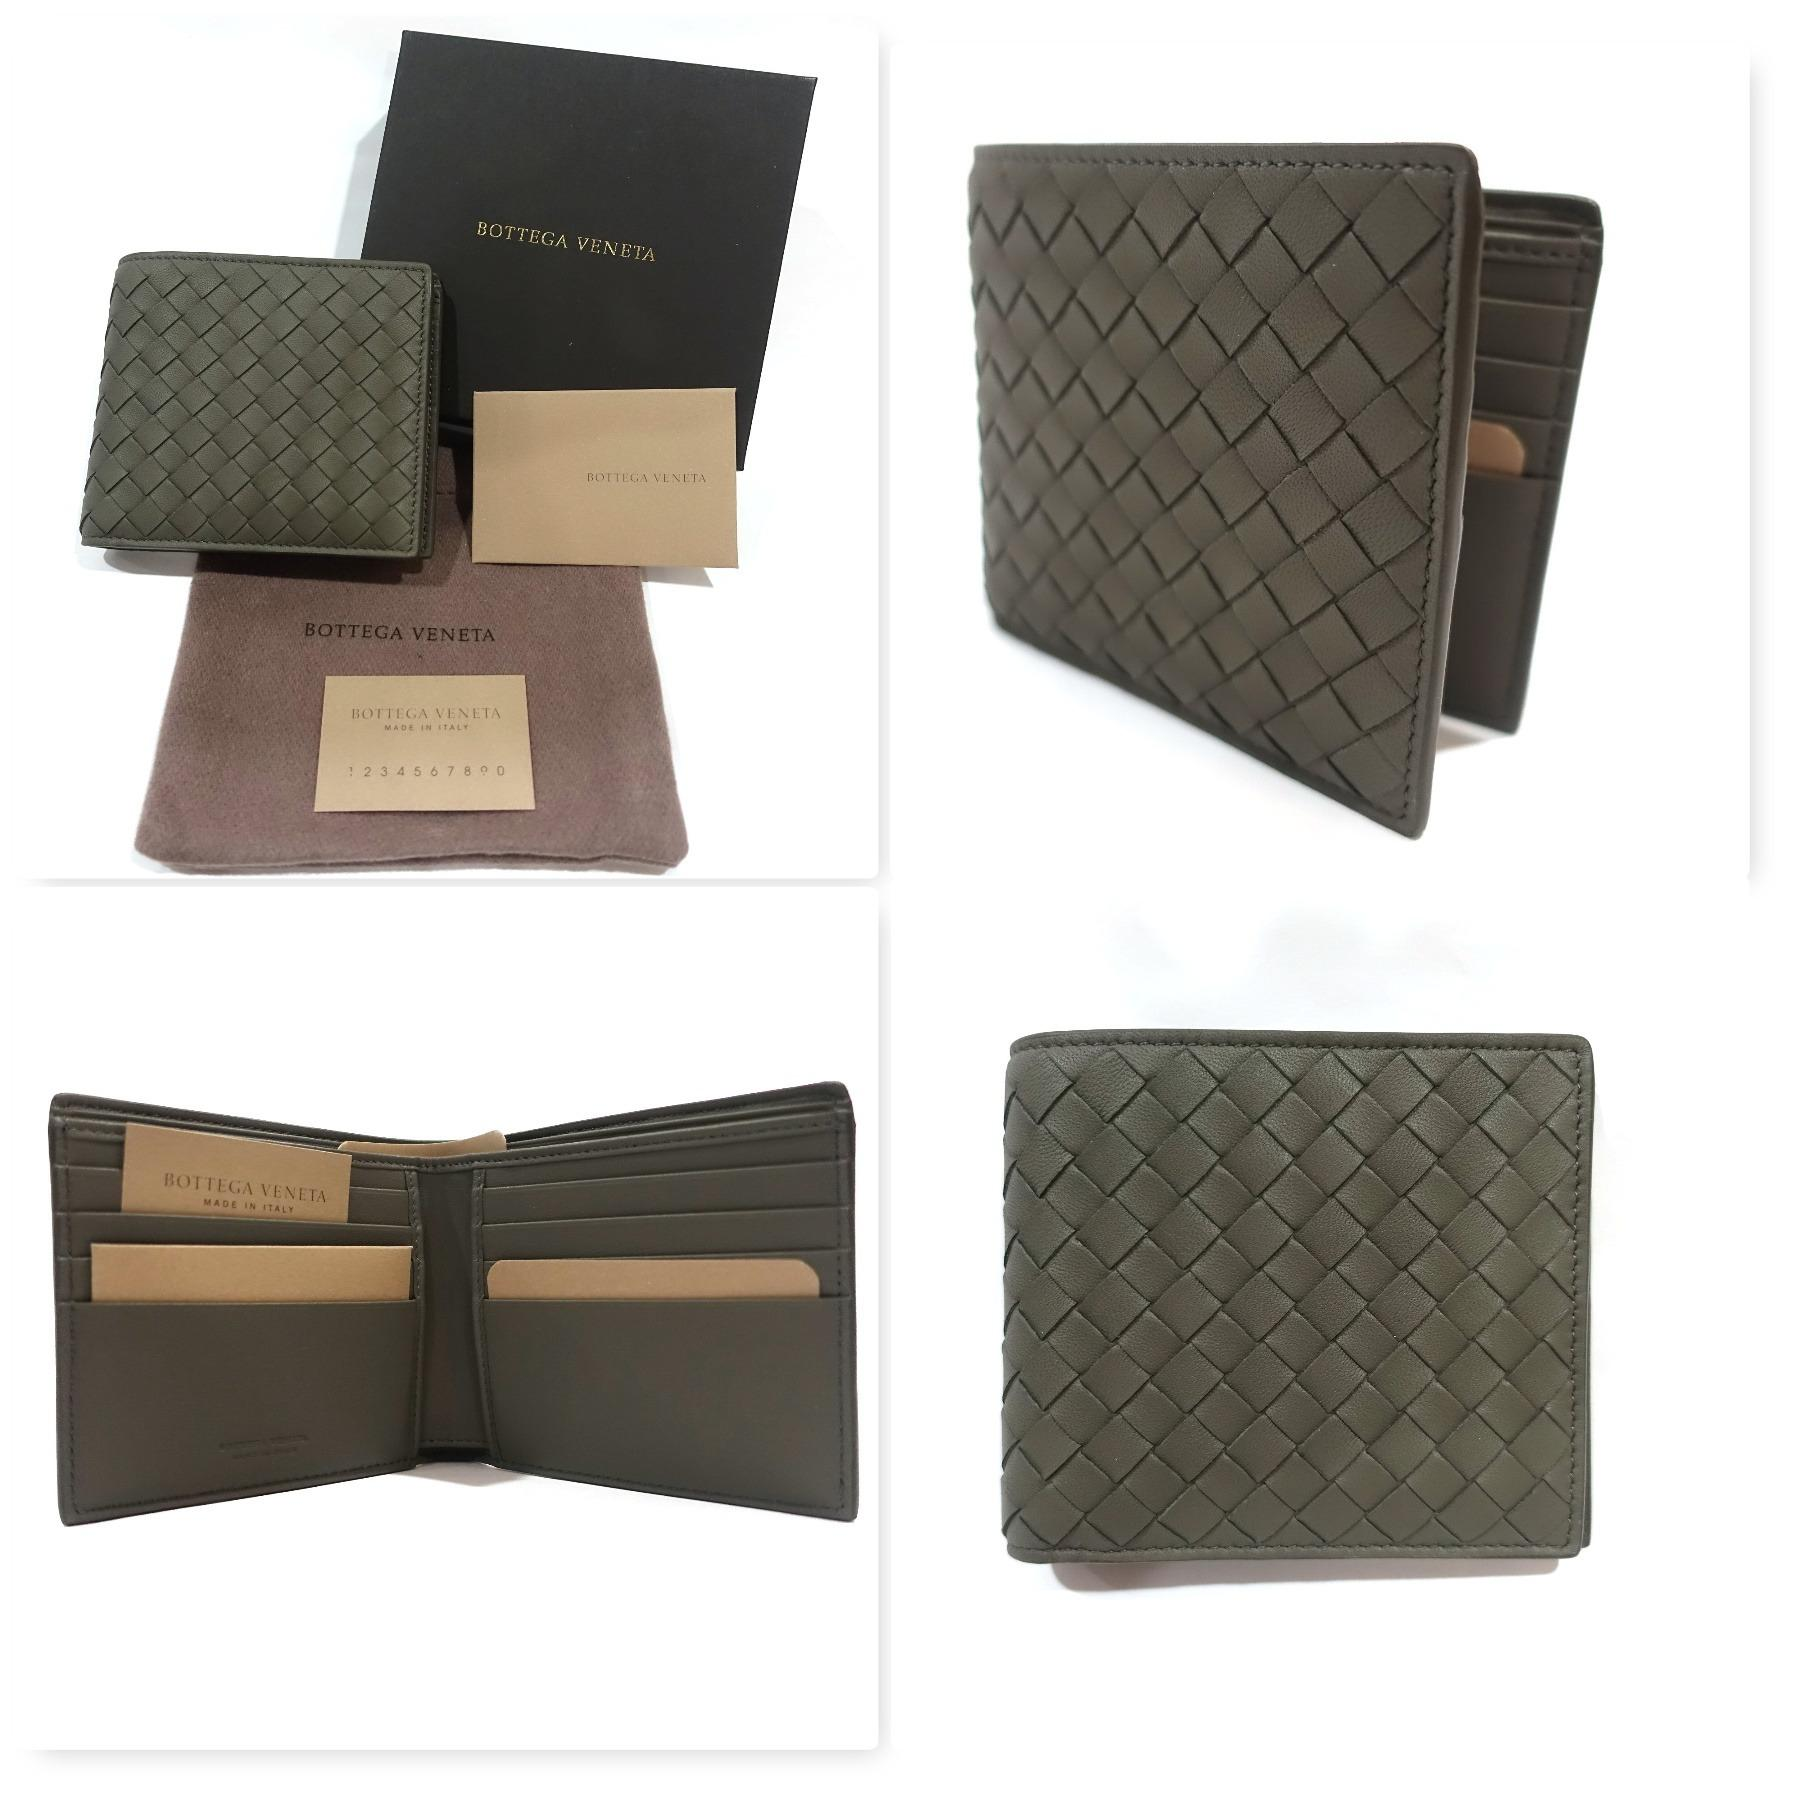 380cc2cb03 Bottega Veneta Bifold Wallet in Ebano with 8 card slots